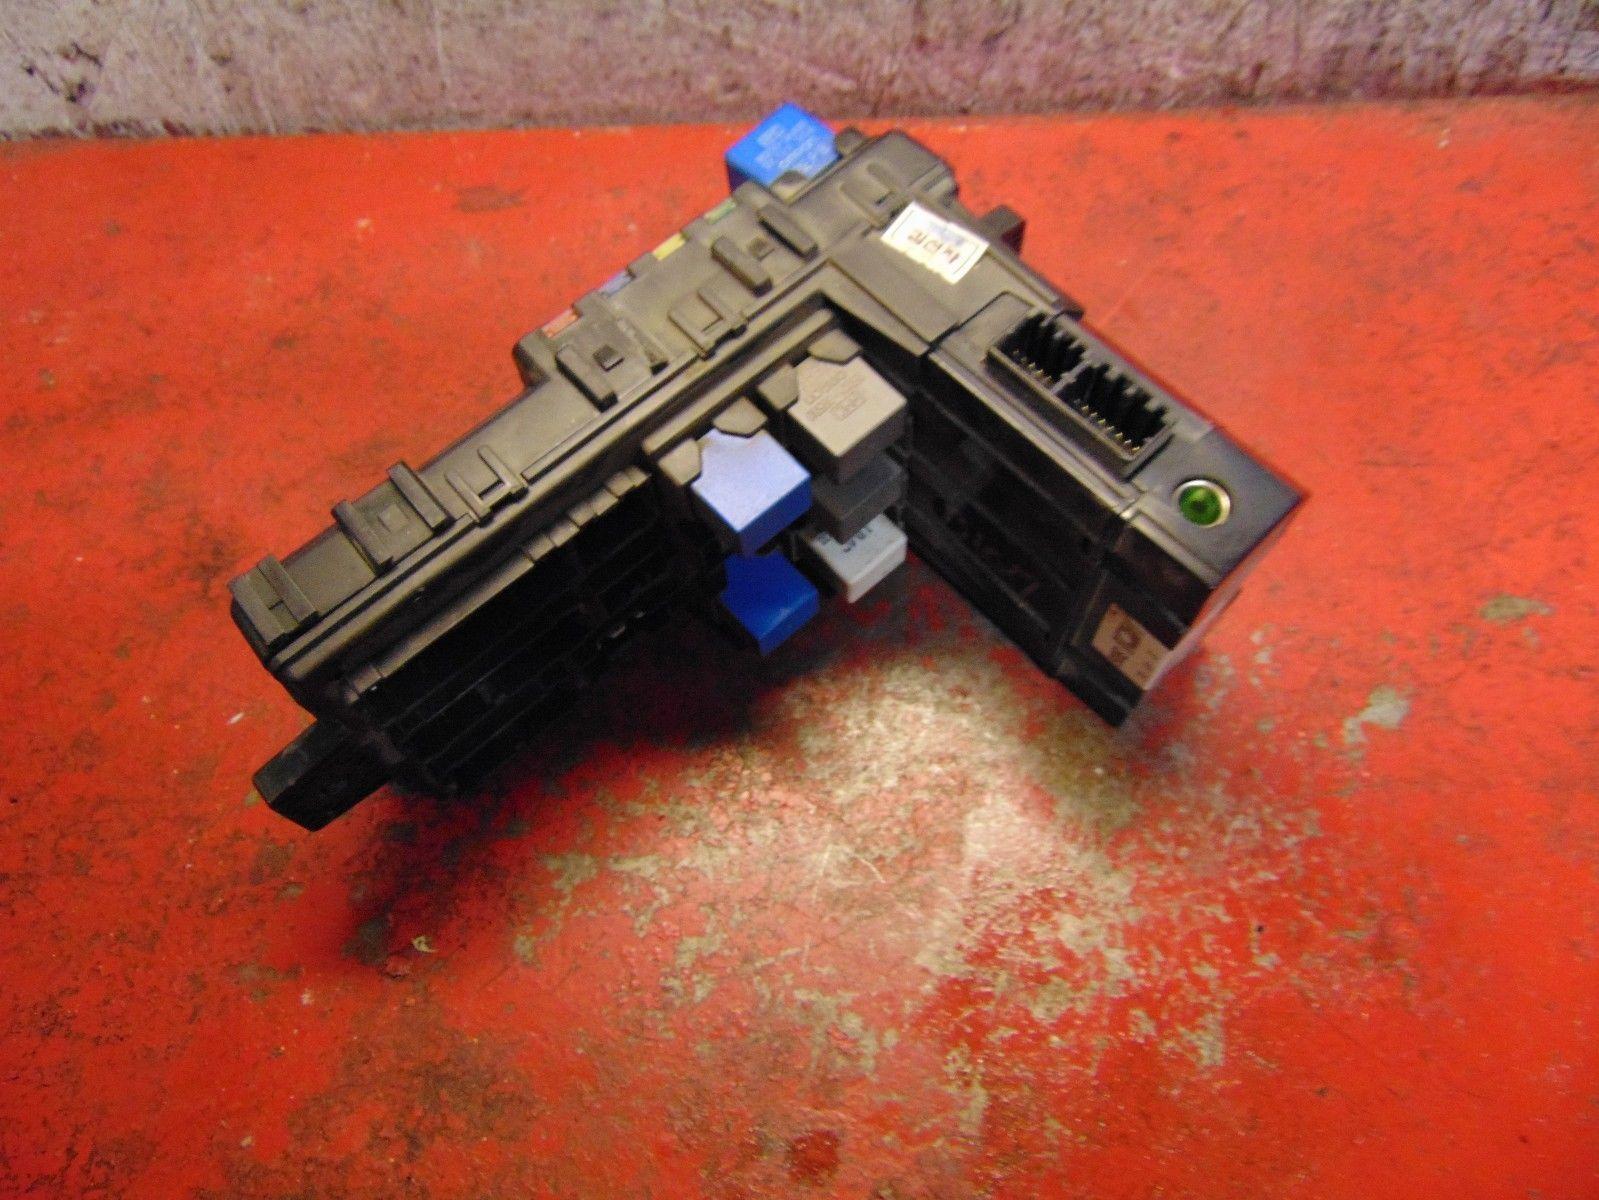 03 06 05 04 Hyundai Santa Fe interior fuse box panel & traction control  module